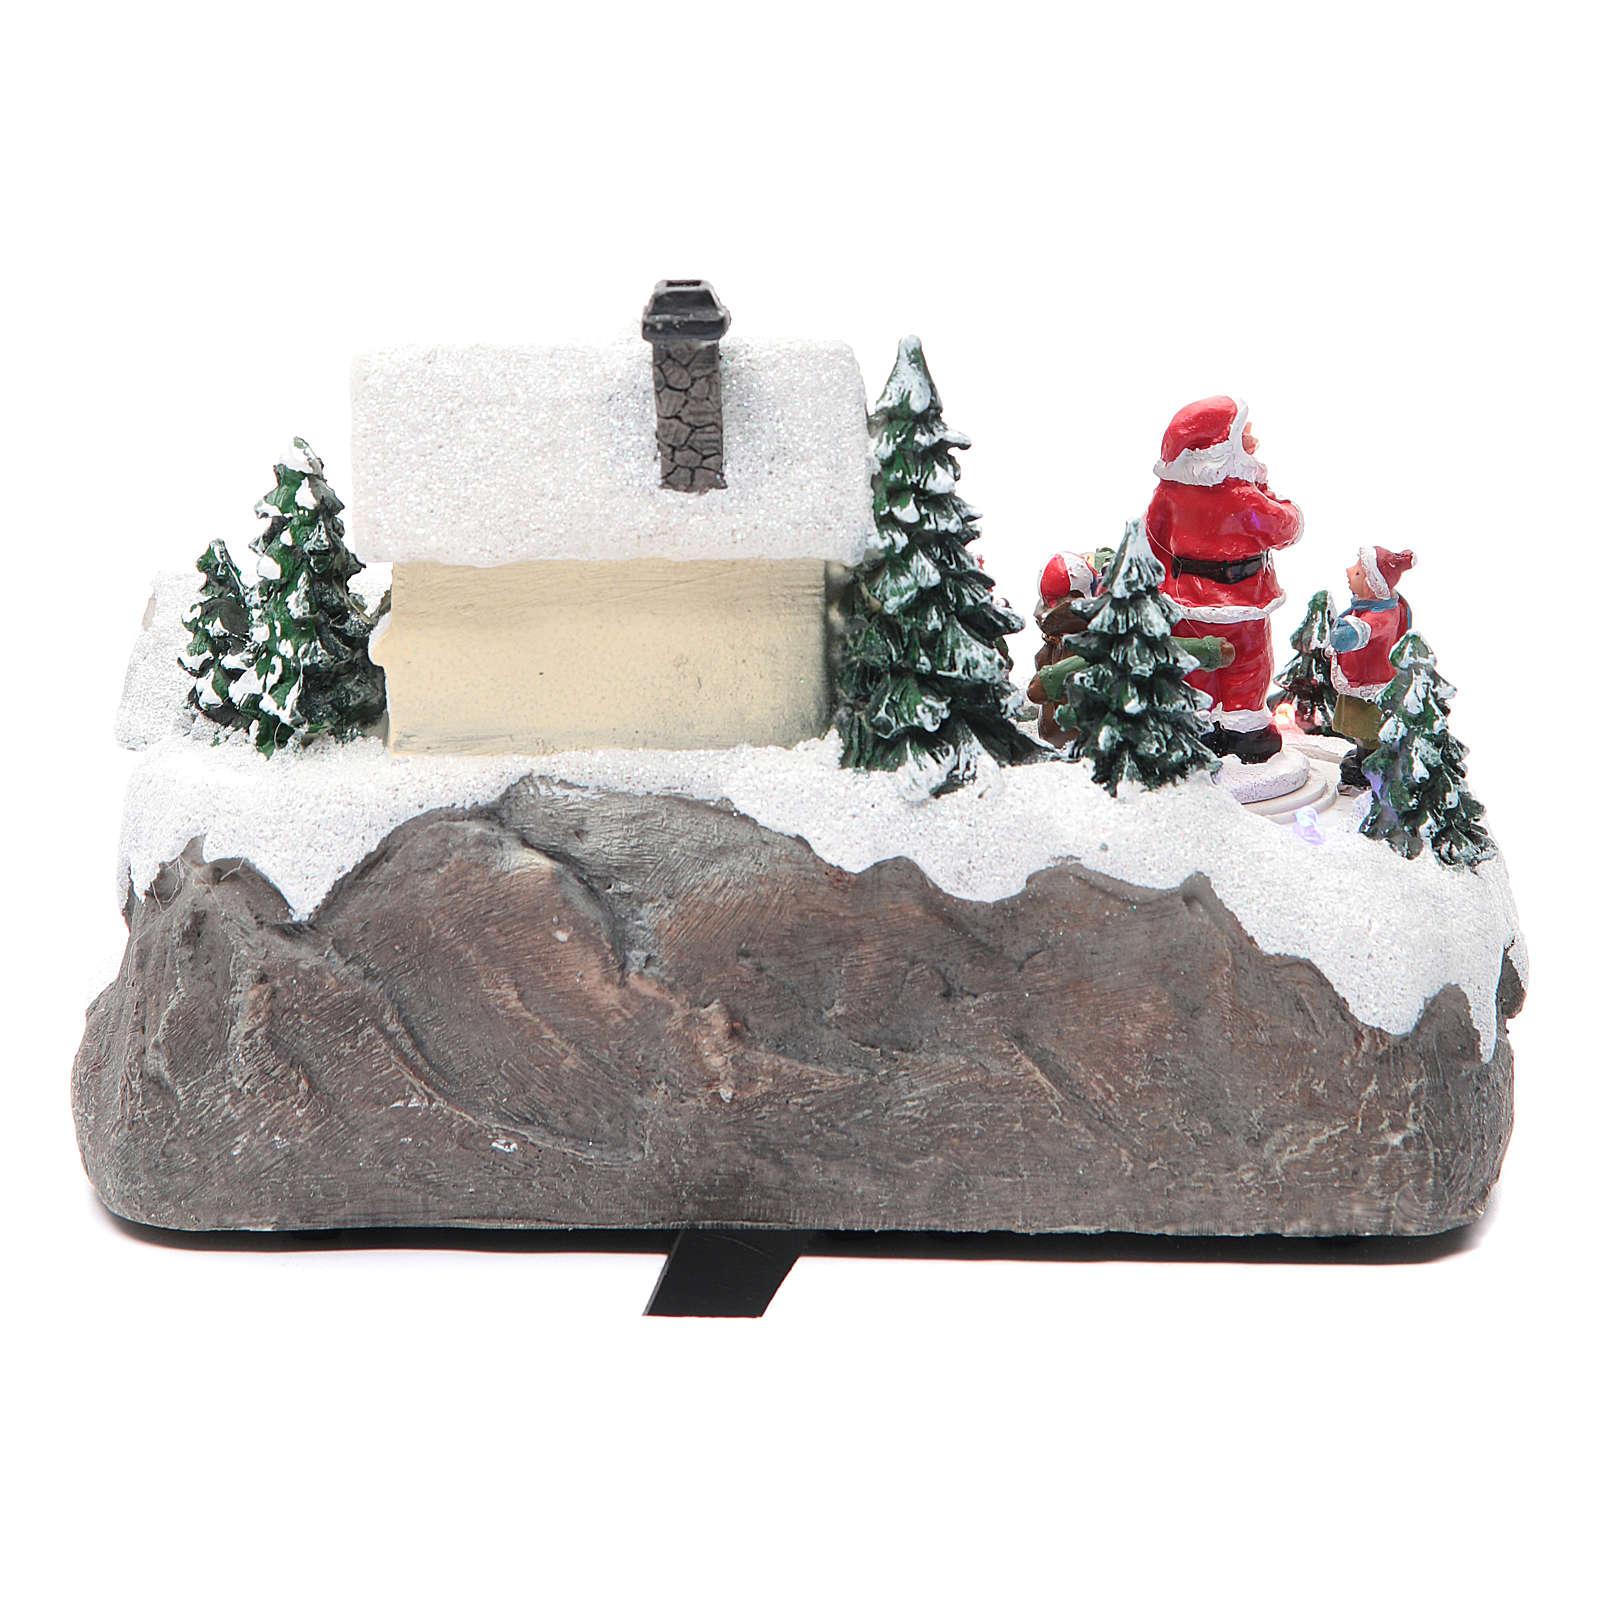 Pueblo Navideño Papá Noel 25x15x15 cm 3